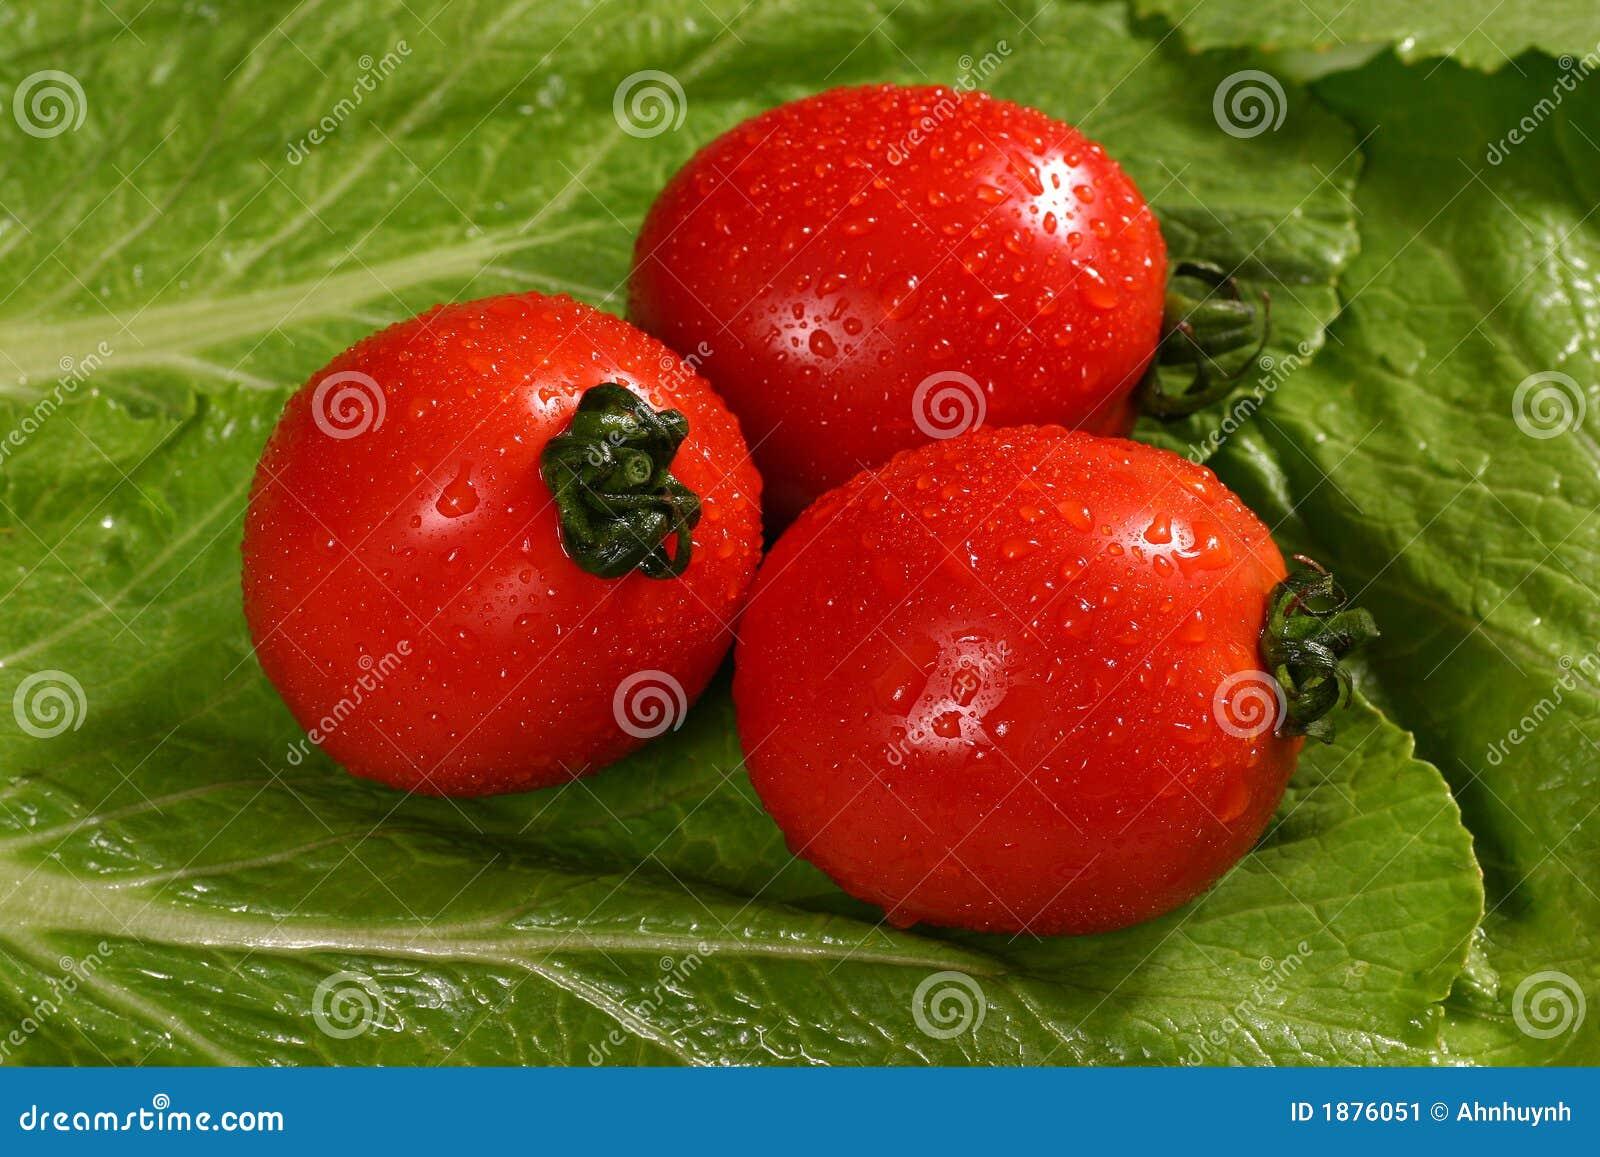 Fresh Red Tomatoes On Lettuce Stock Image - Image: 1876051